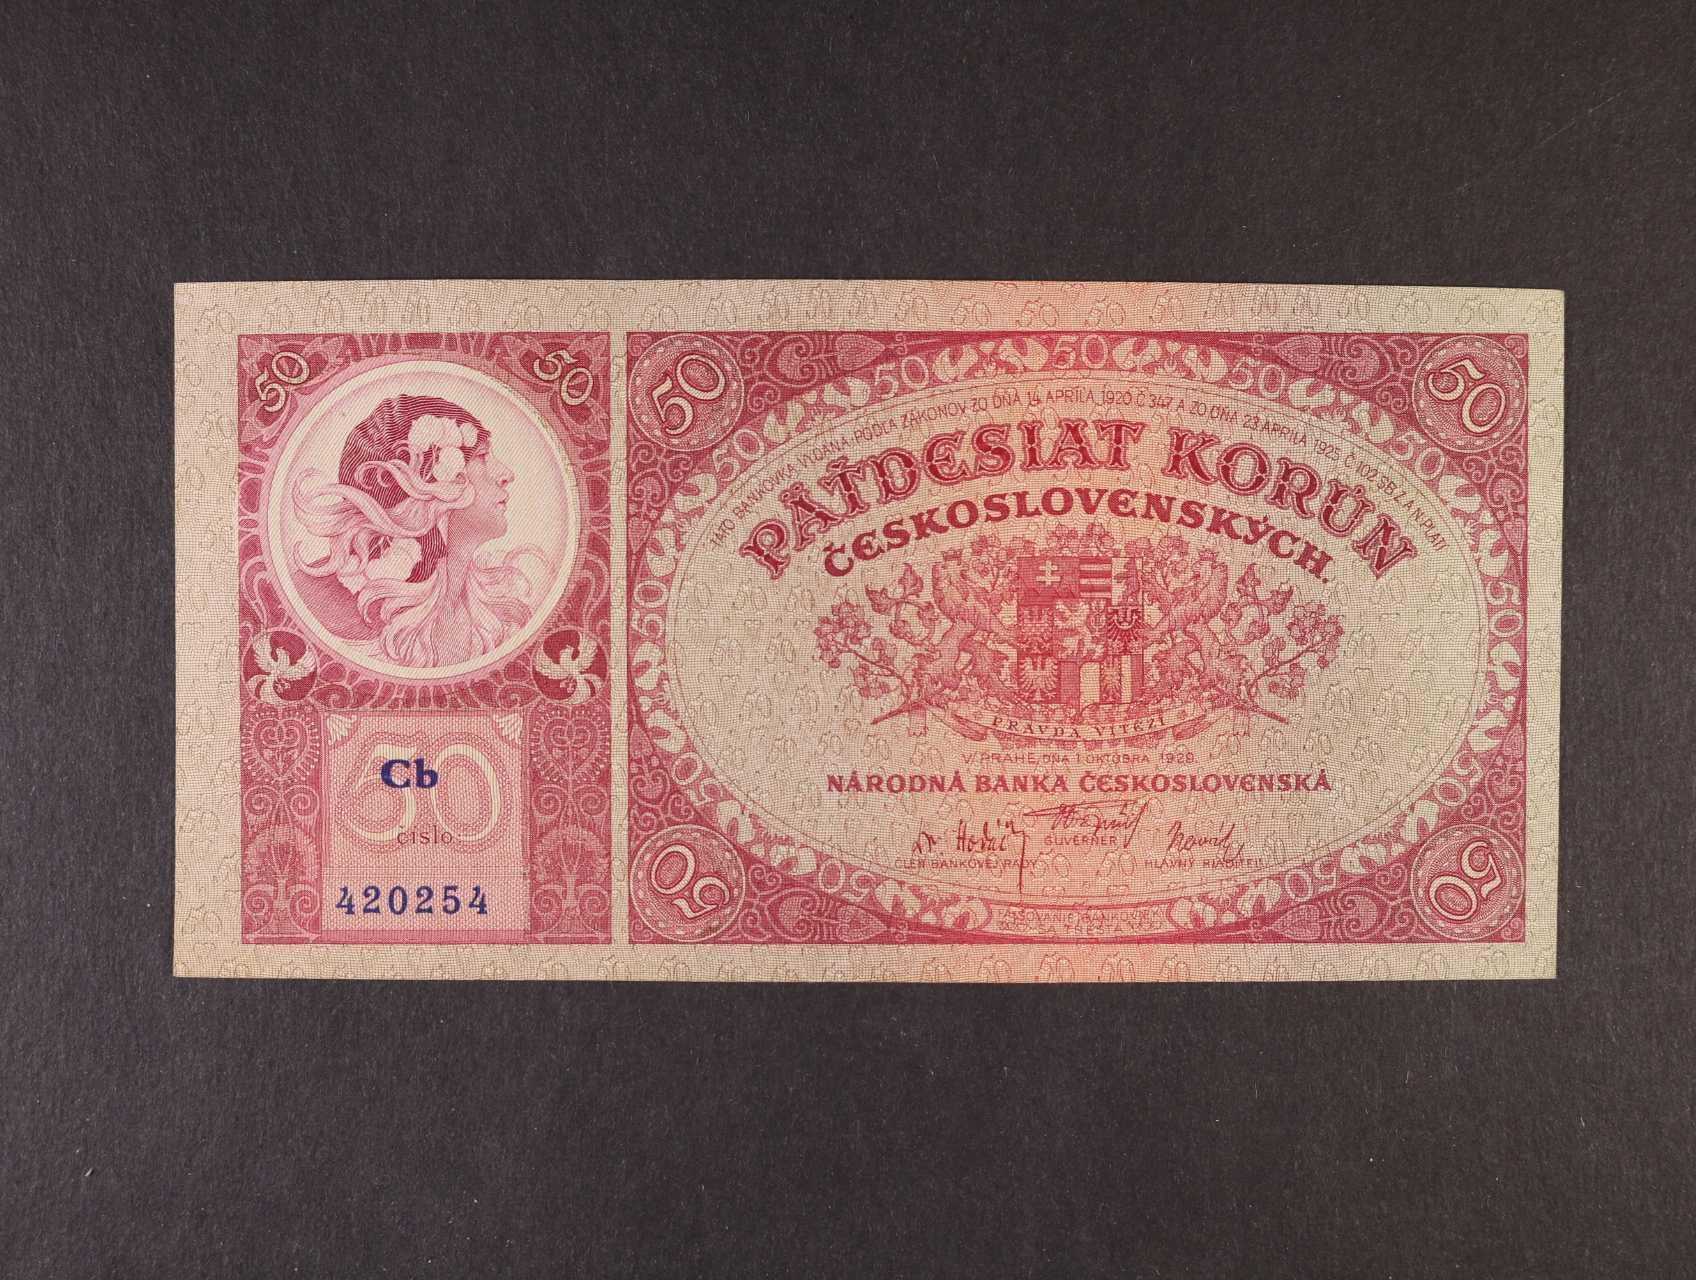 50 Kč 1.10.1929 série Cb, Ba. 24b, Pi. 22a